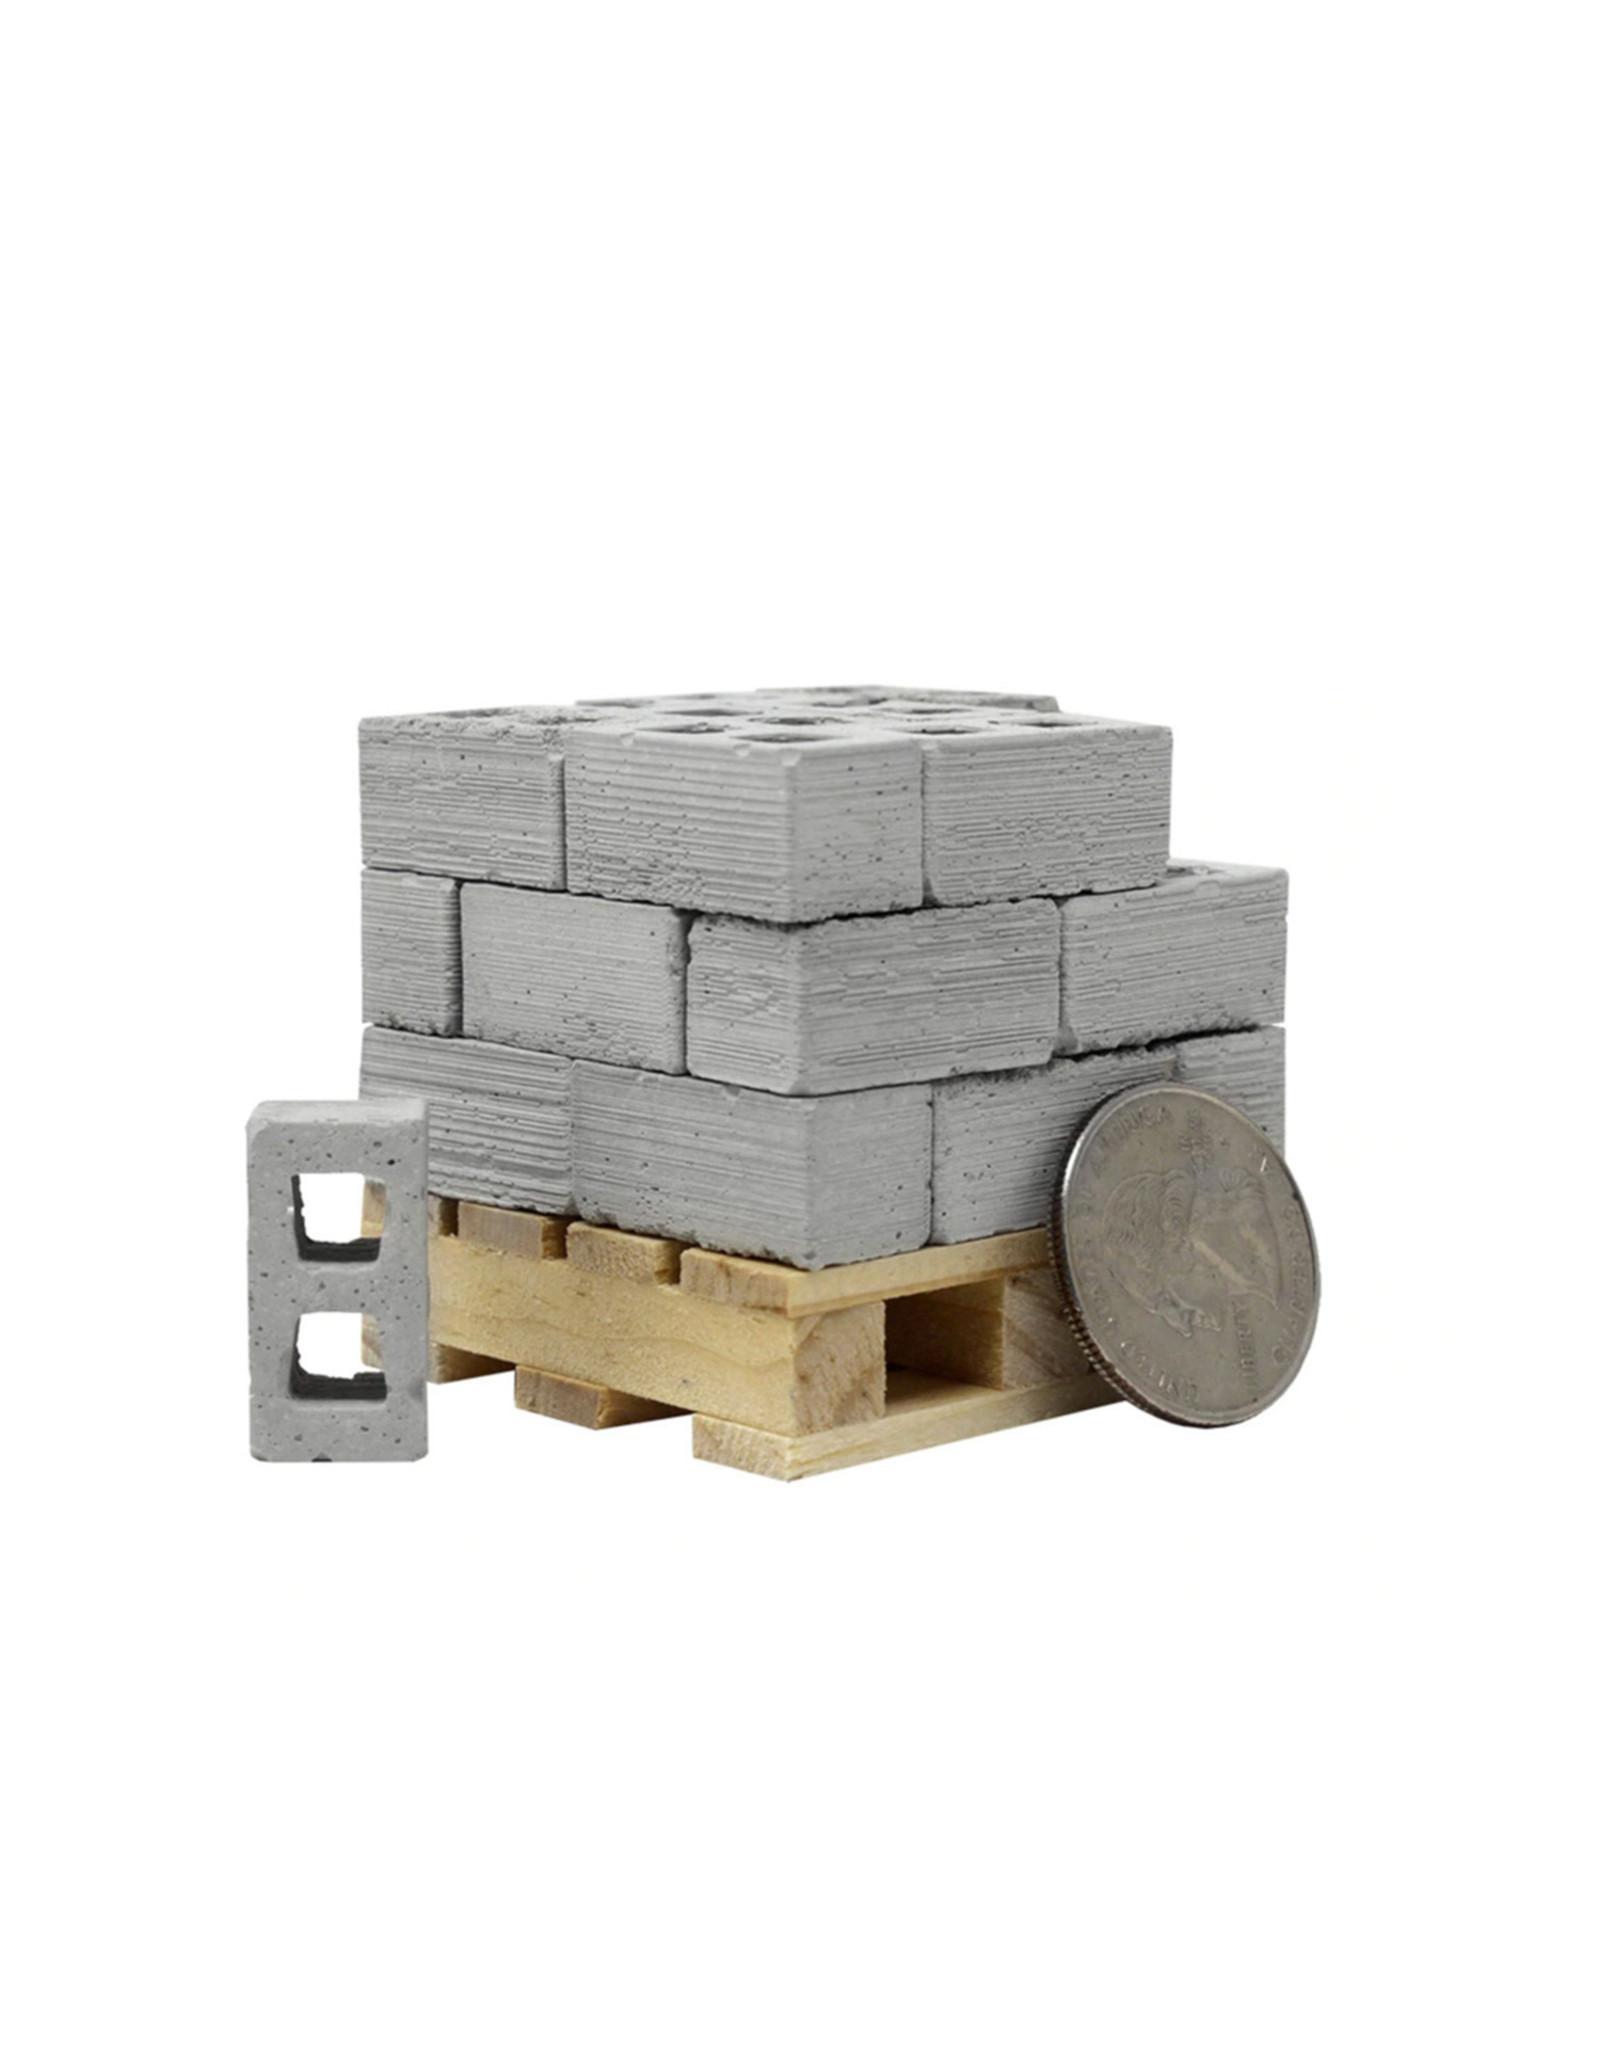 Mini Materials 1:12 Cinder Blocks (Cinders)